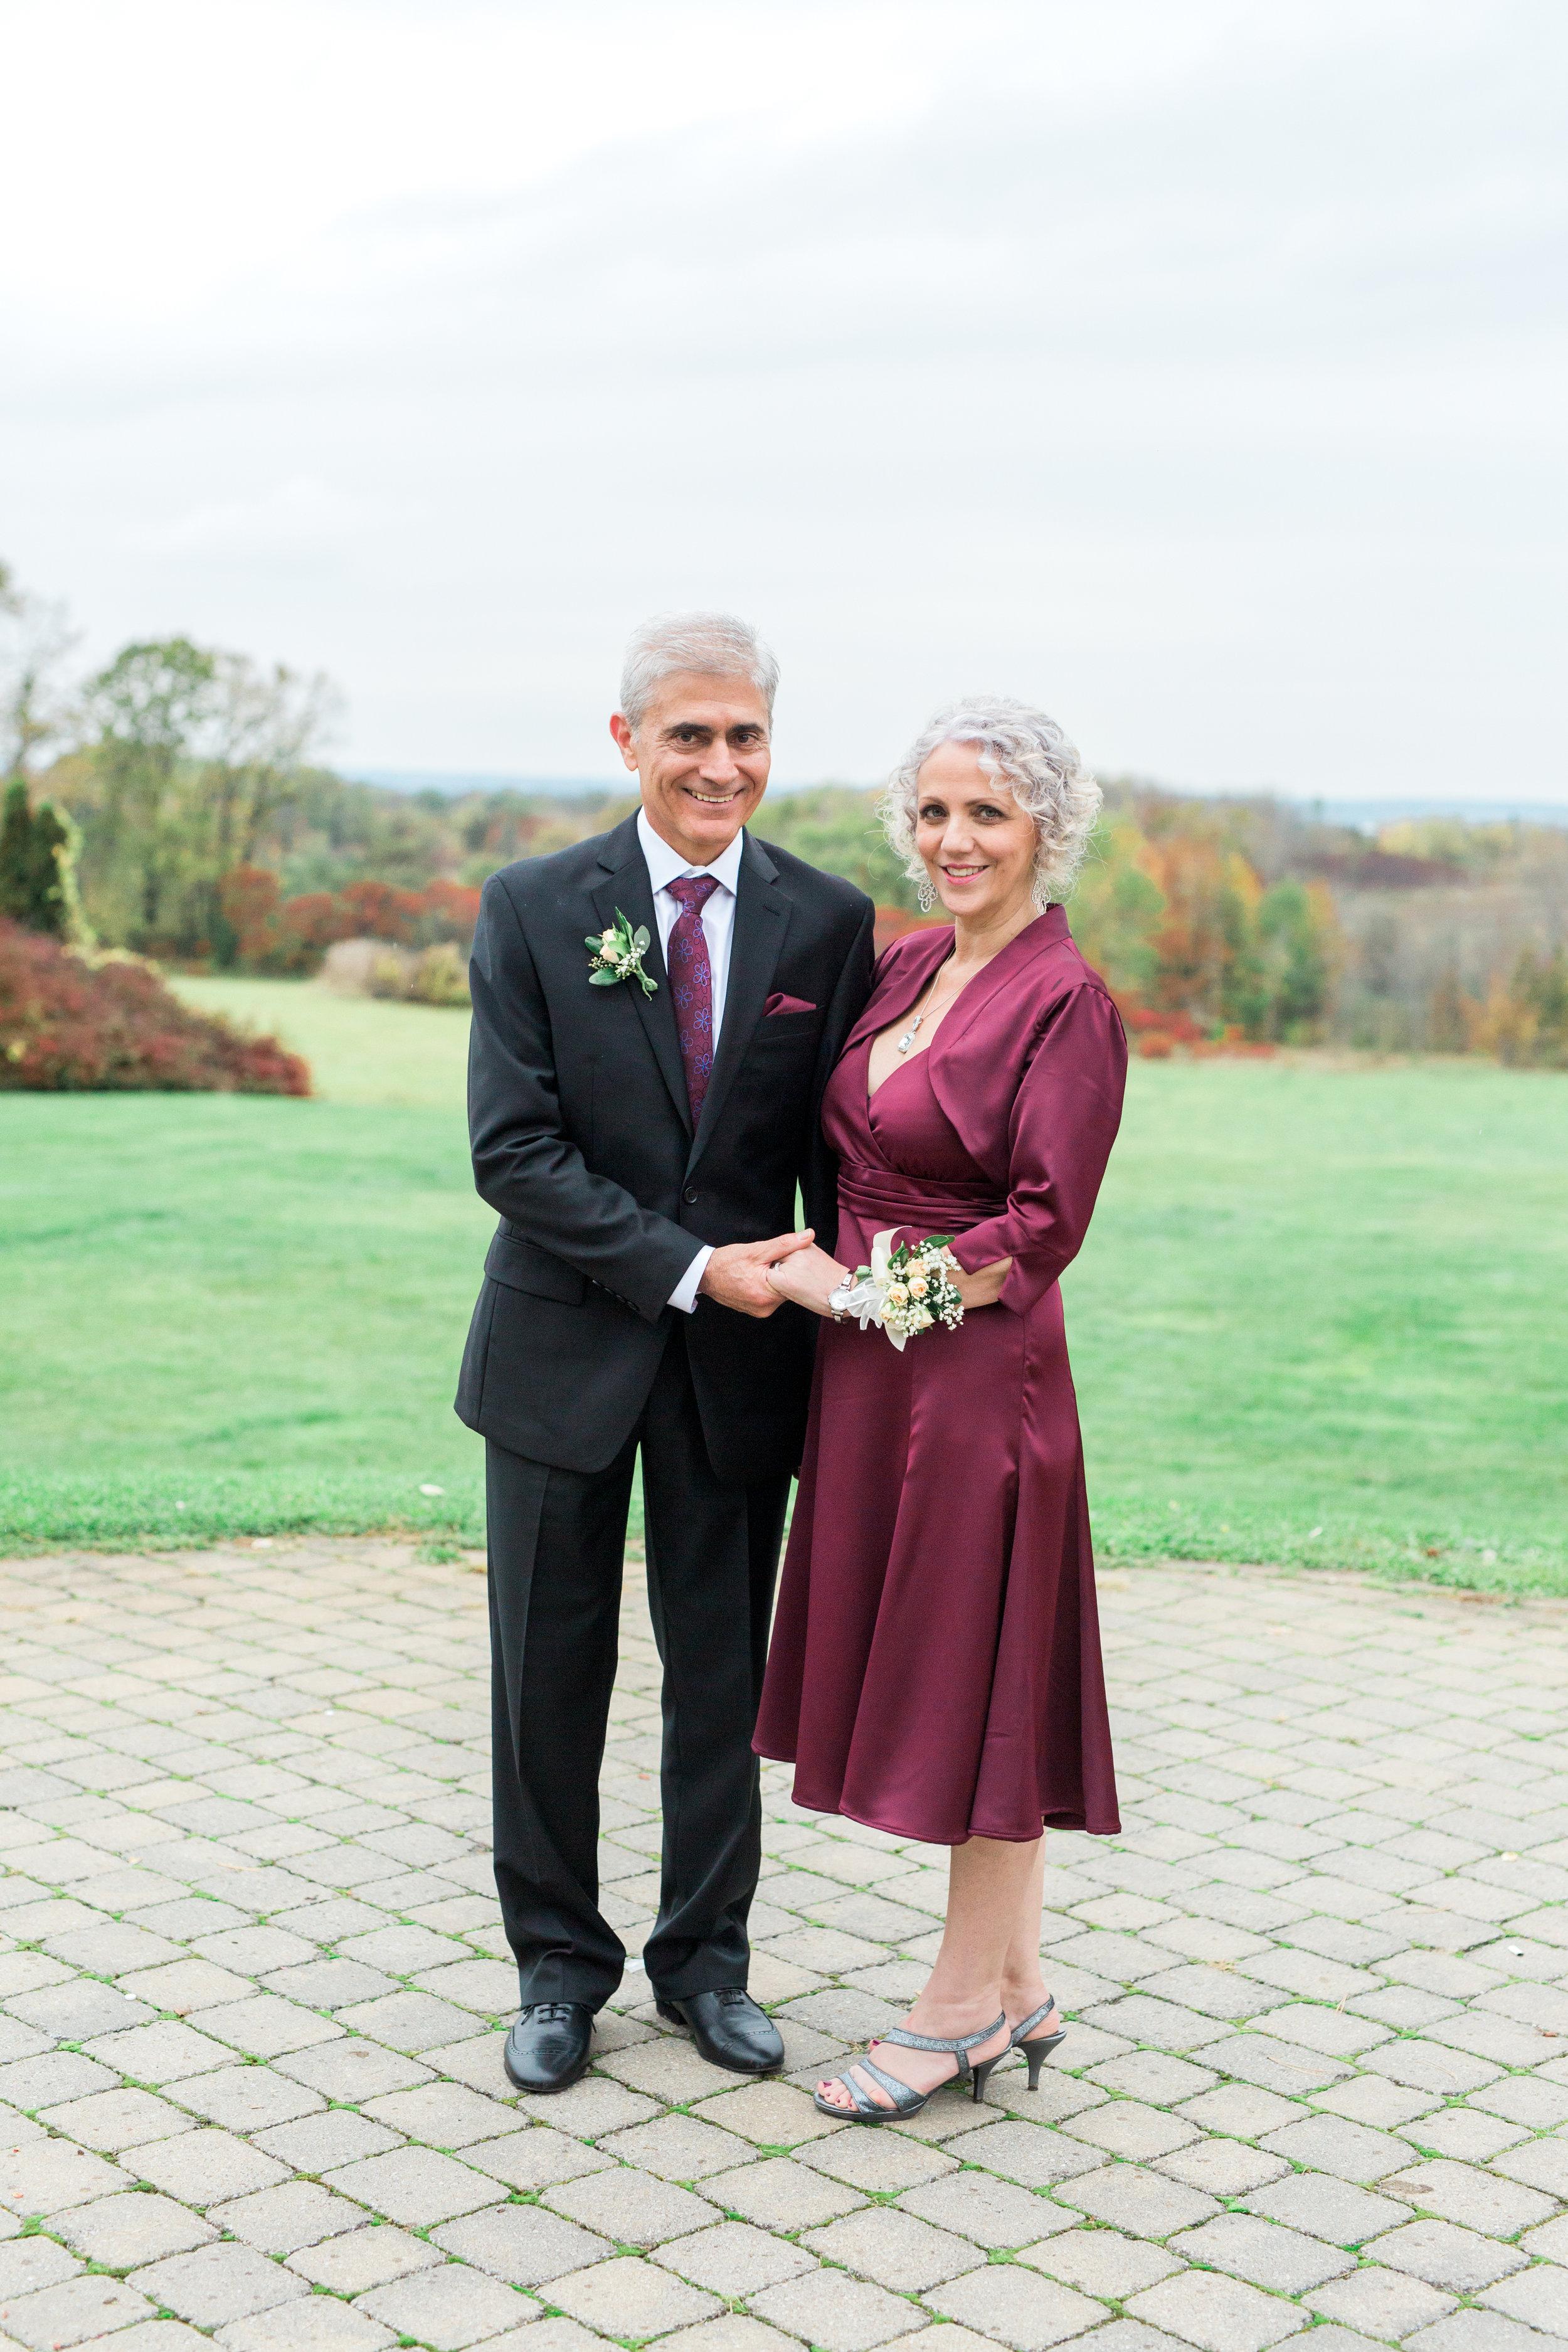 Amir-Golbazi-Danielle-Giroux-Photography_Toronto-Wedding_Cedarwood_Rachel-Paul_381.jpg